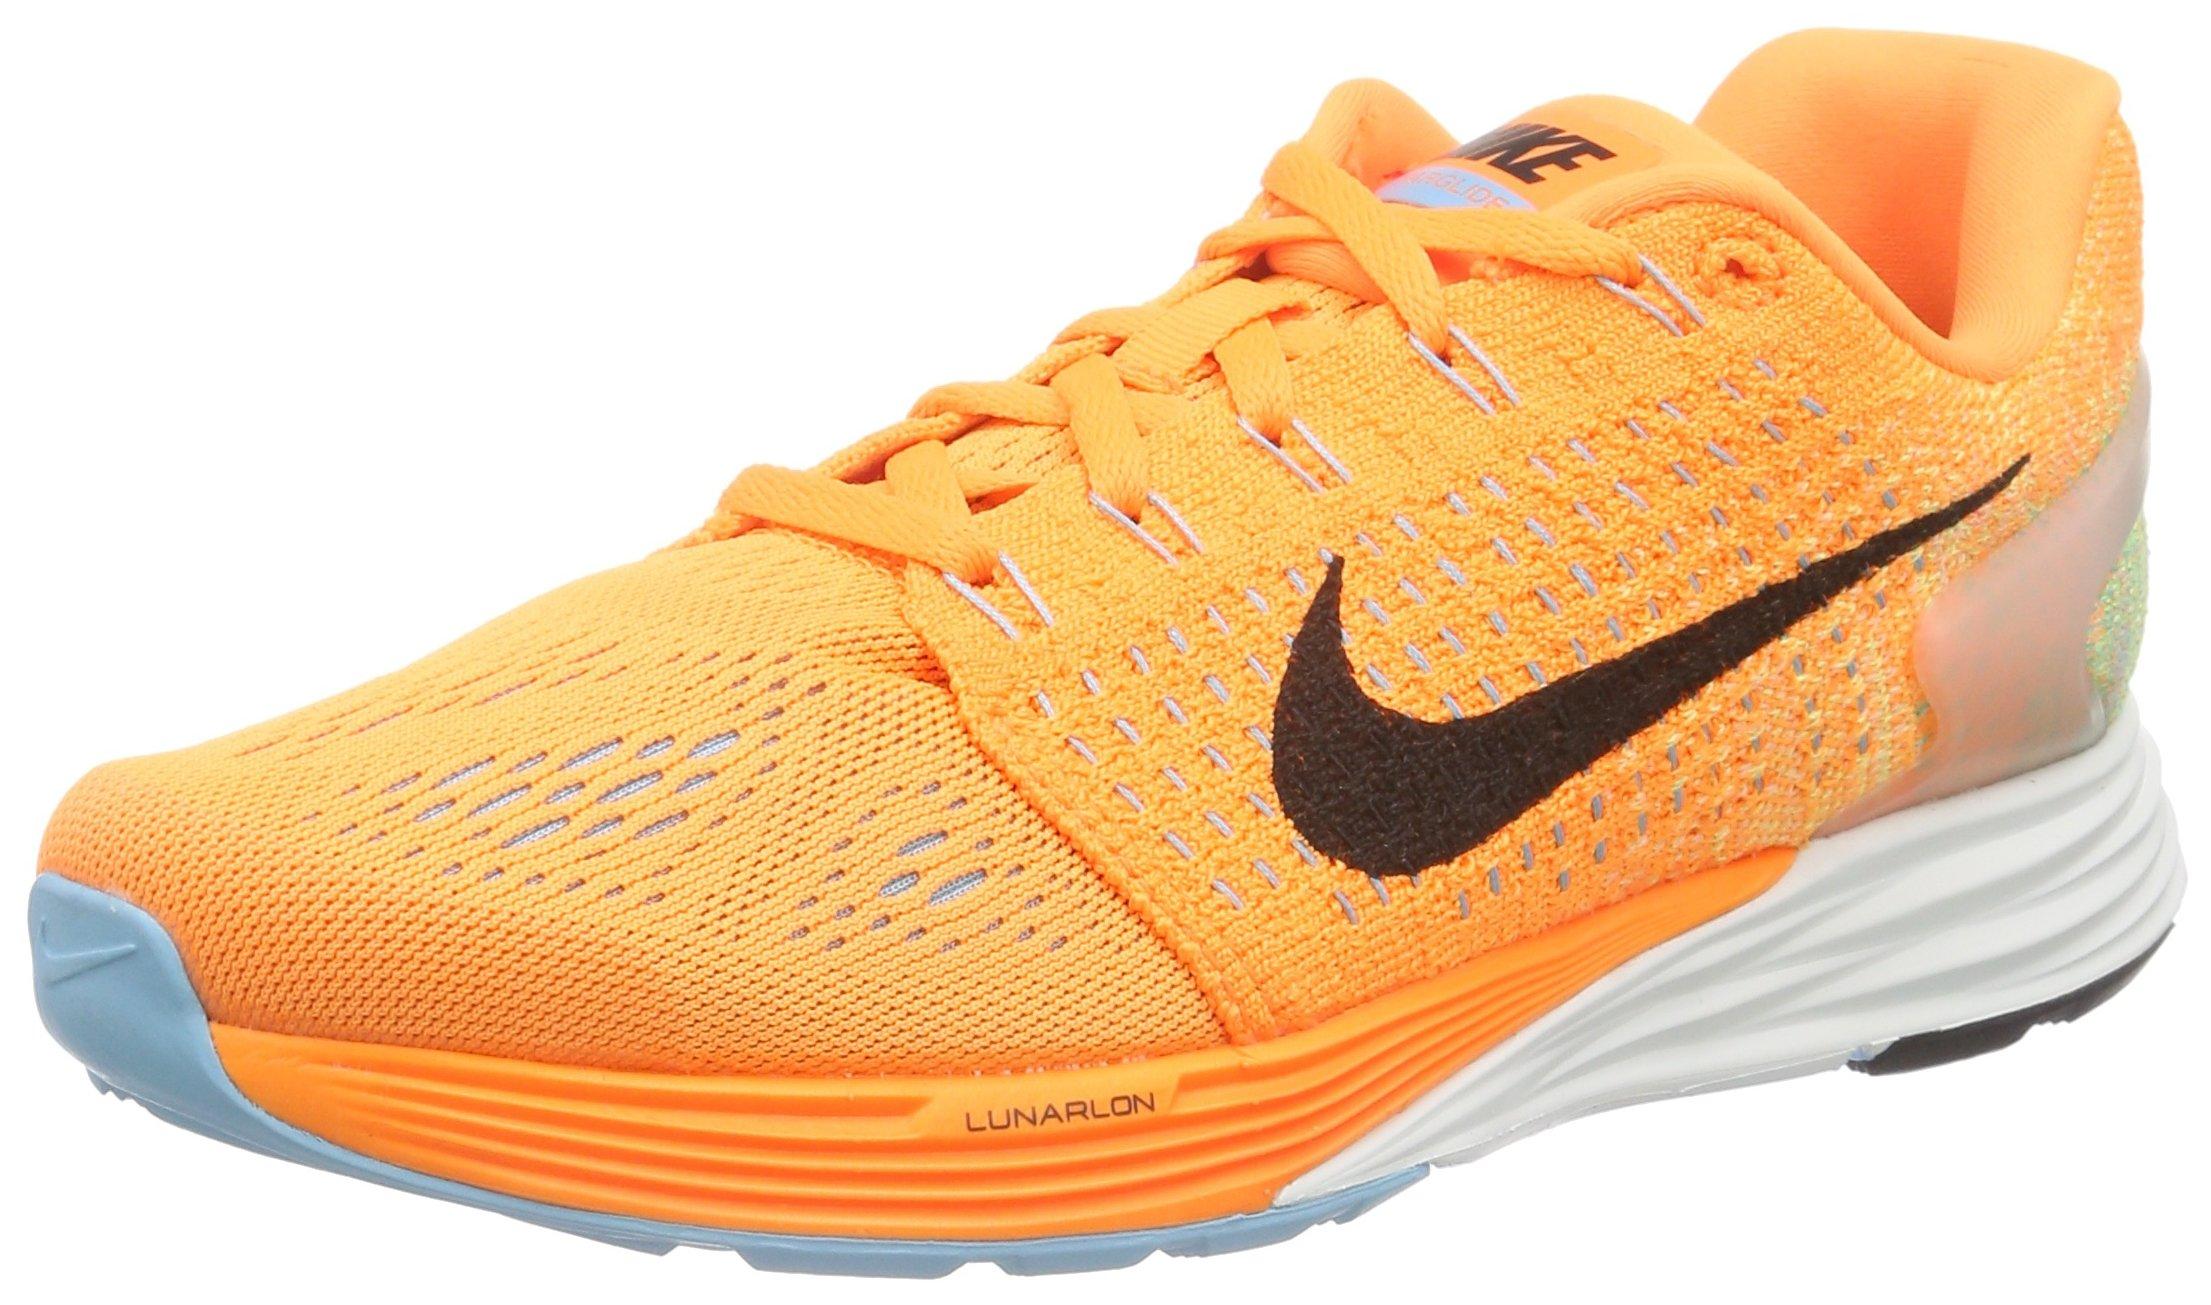 37dfac97b59b Galleon - Nike Women s Lunarglide 7 Bright Citrus Black Tide Pool Blue  Ankle-High Running Shoe - 6M